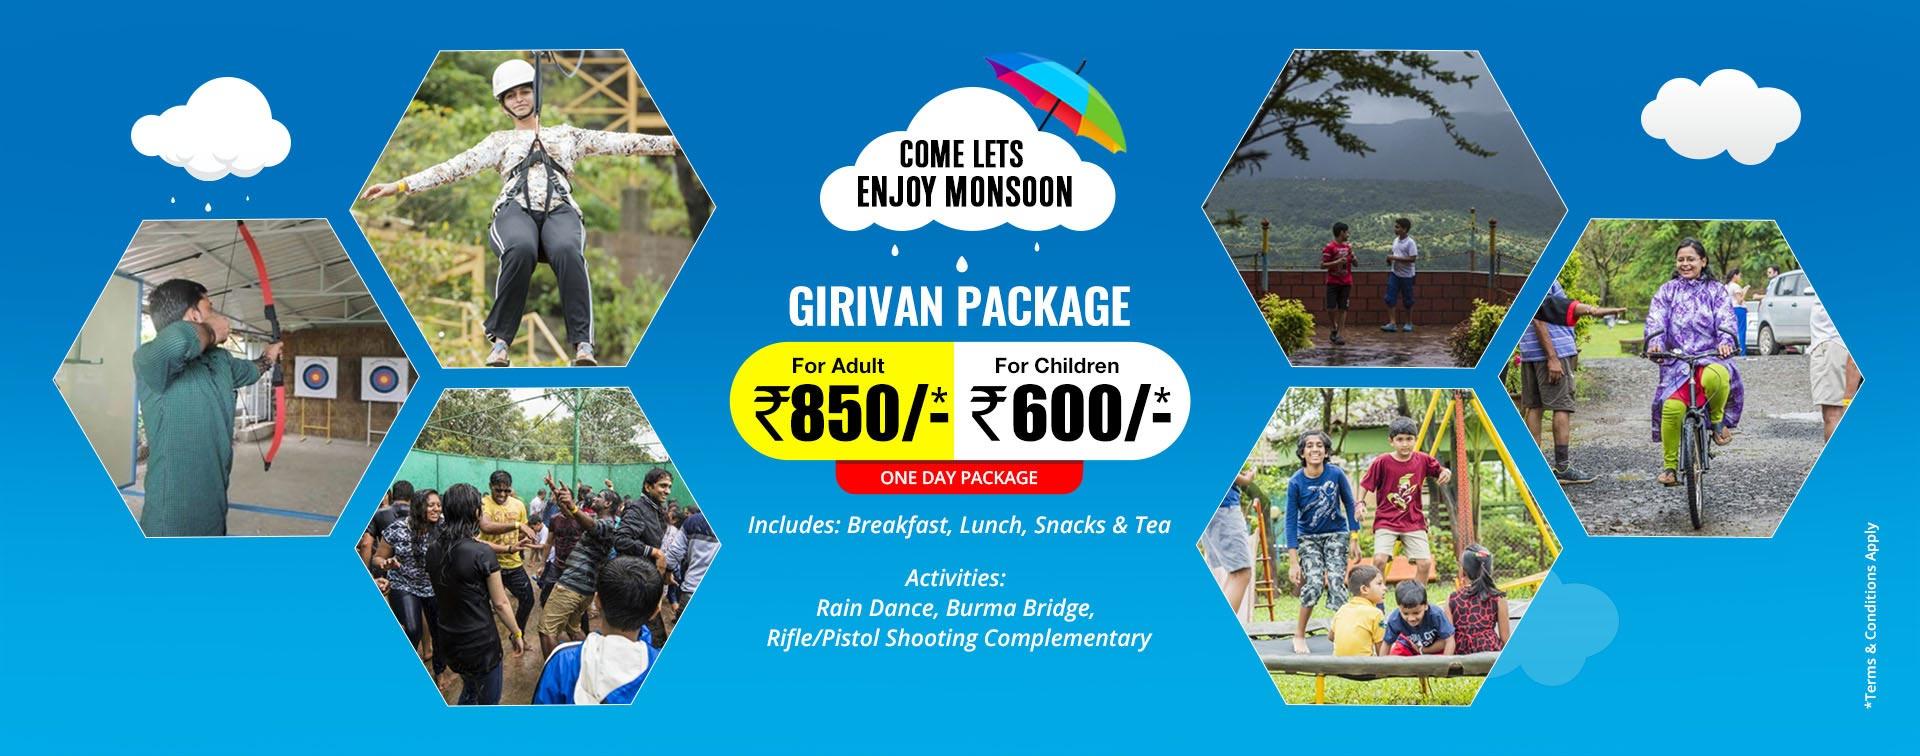 Girivan Picnic Resort, Mulshi, Pune